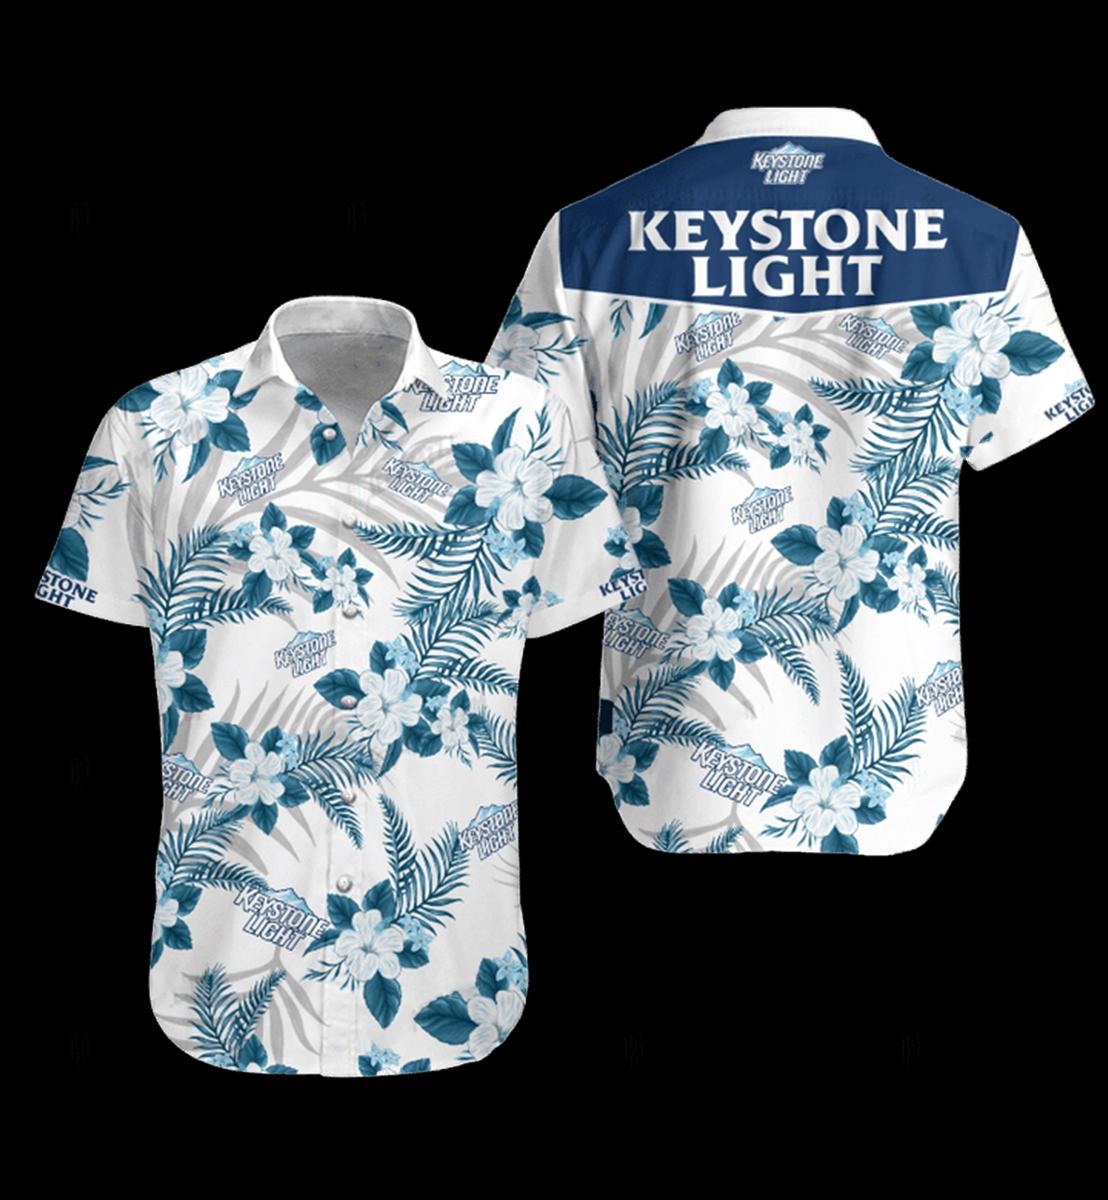 29 Keystone Light hawaiian shirt and Short 1 1